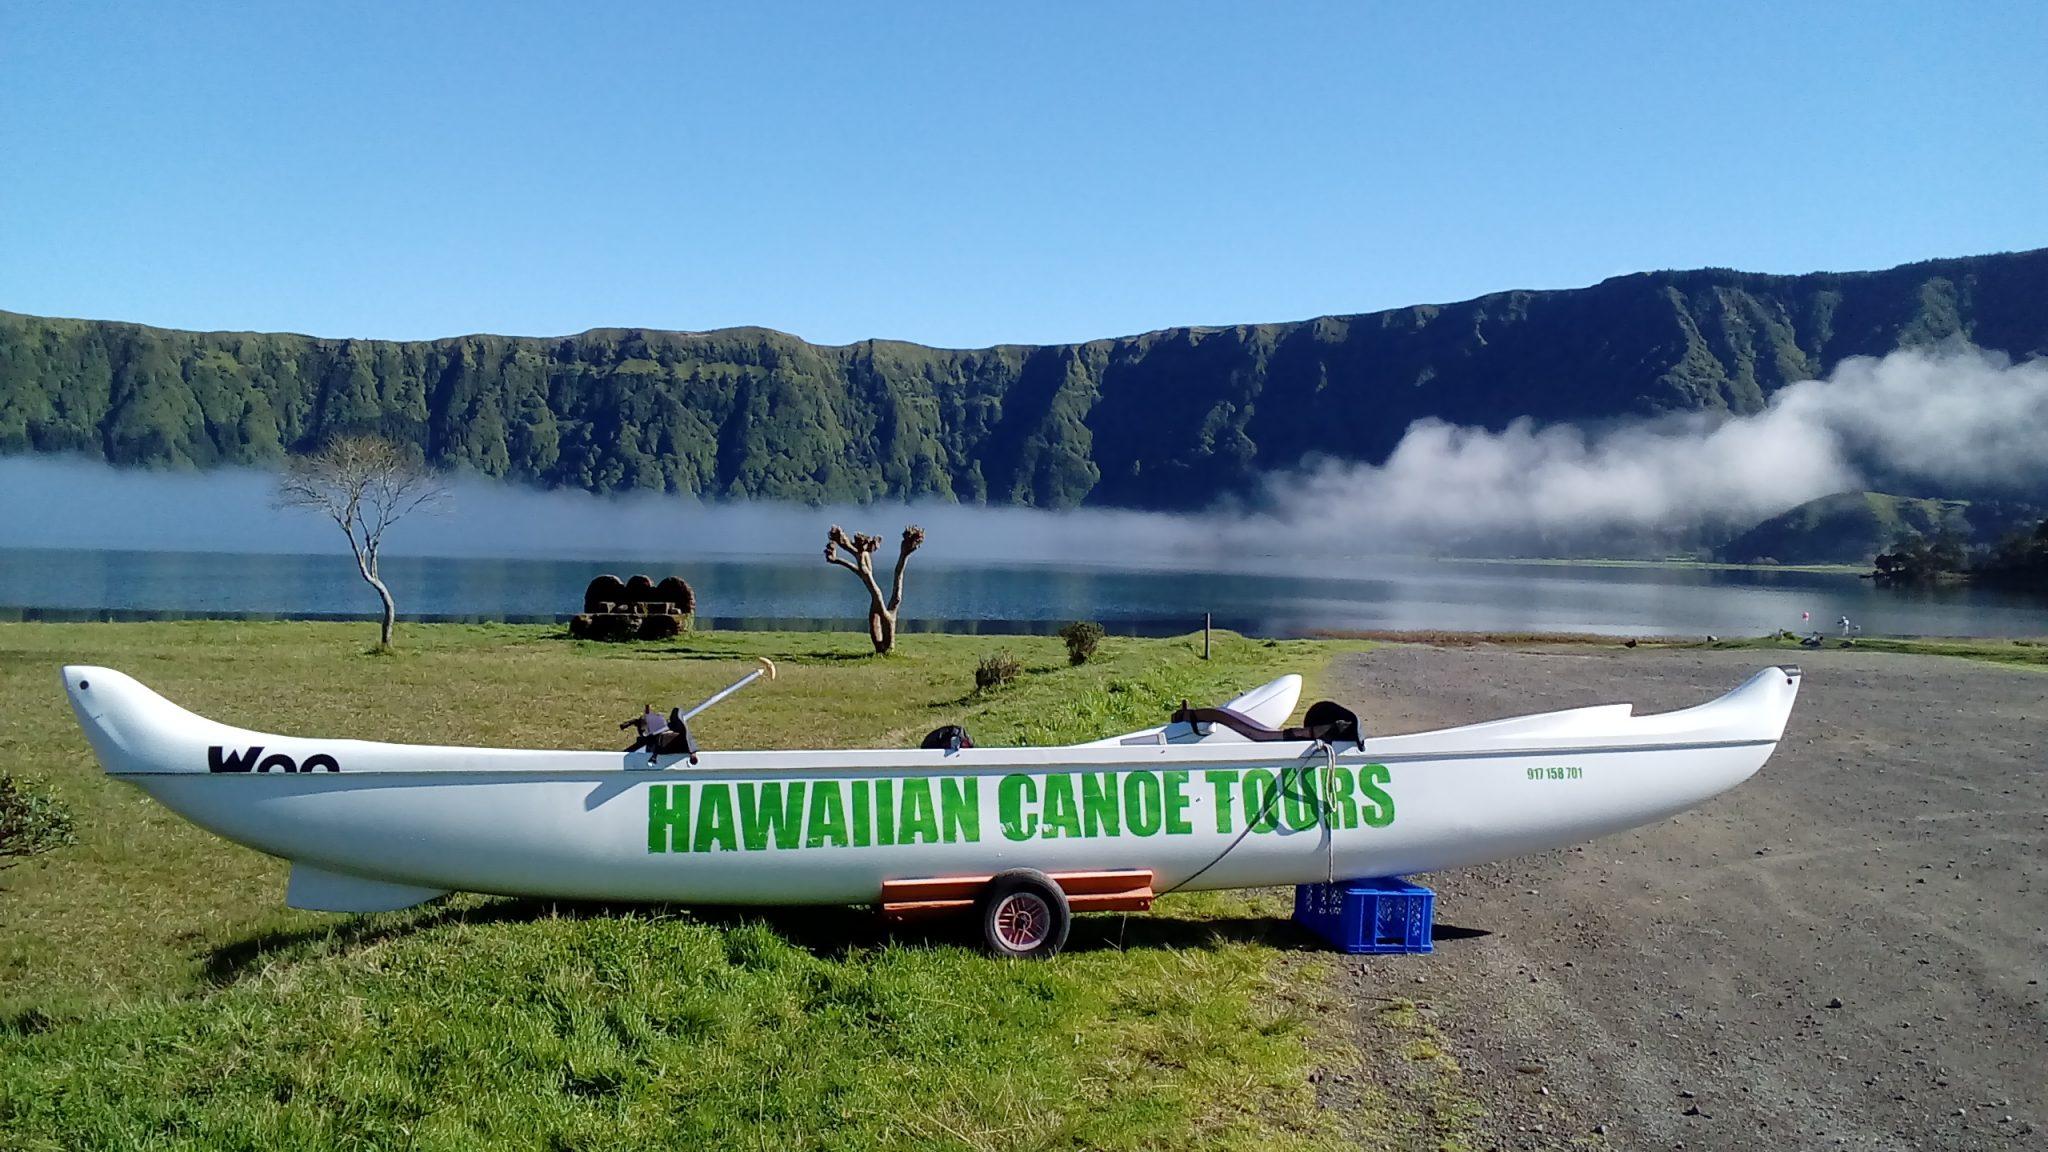 © GAROUPA CANOE TOURS